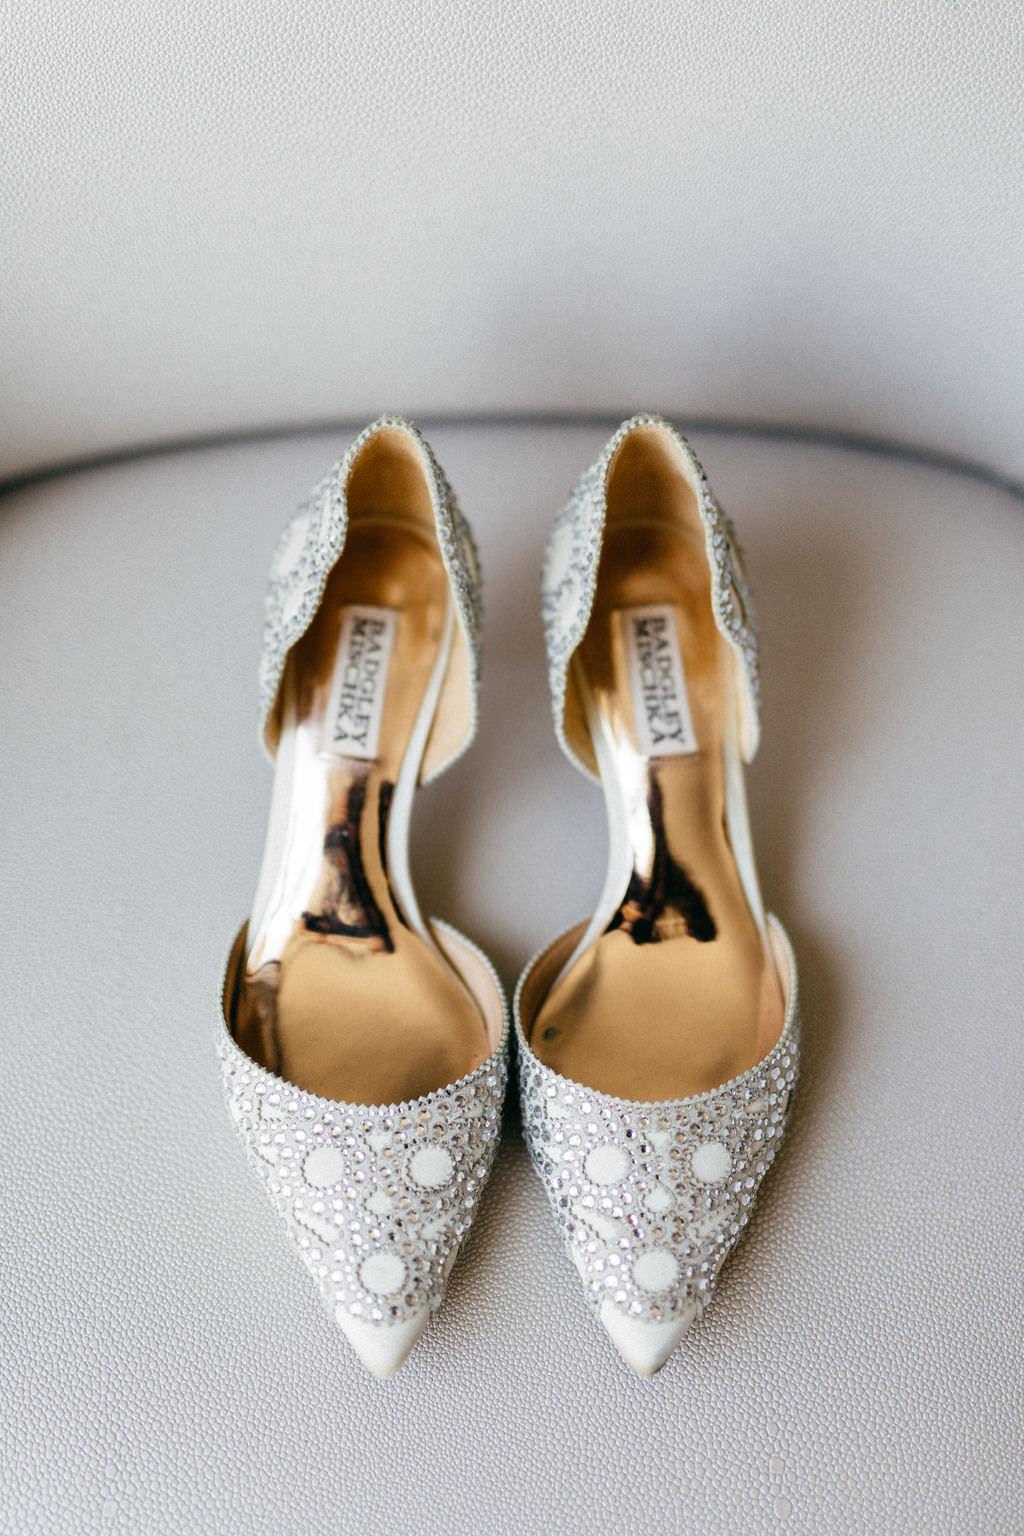 Pointed Toe Silver Rhinestone Badgley Mischka Bridal Wedding Shoes